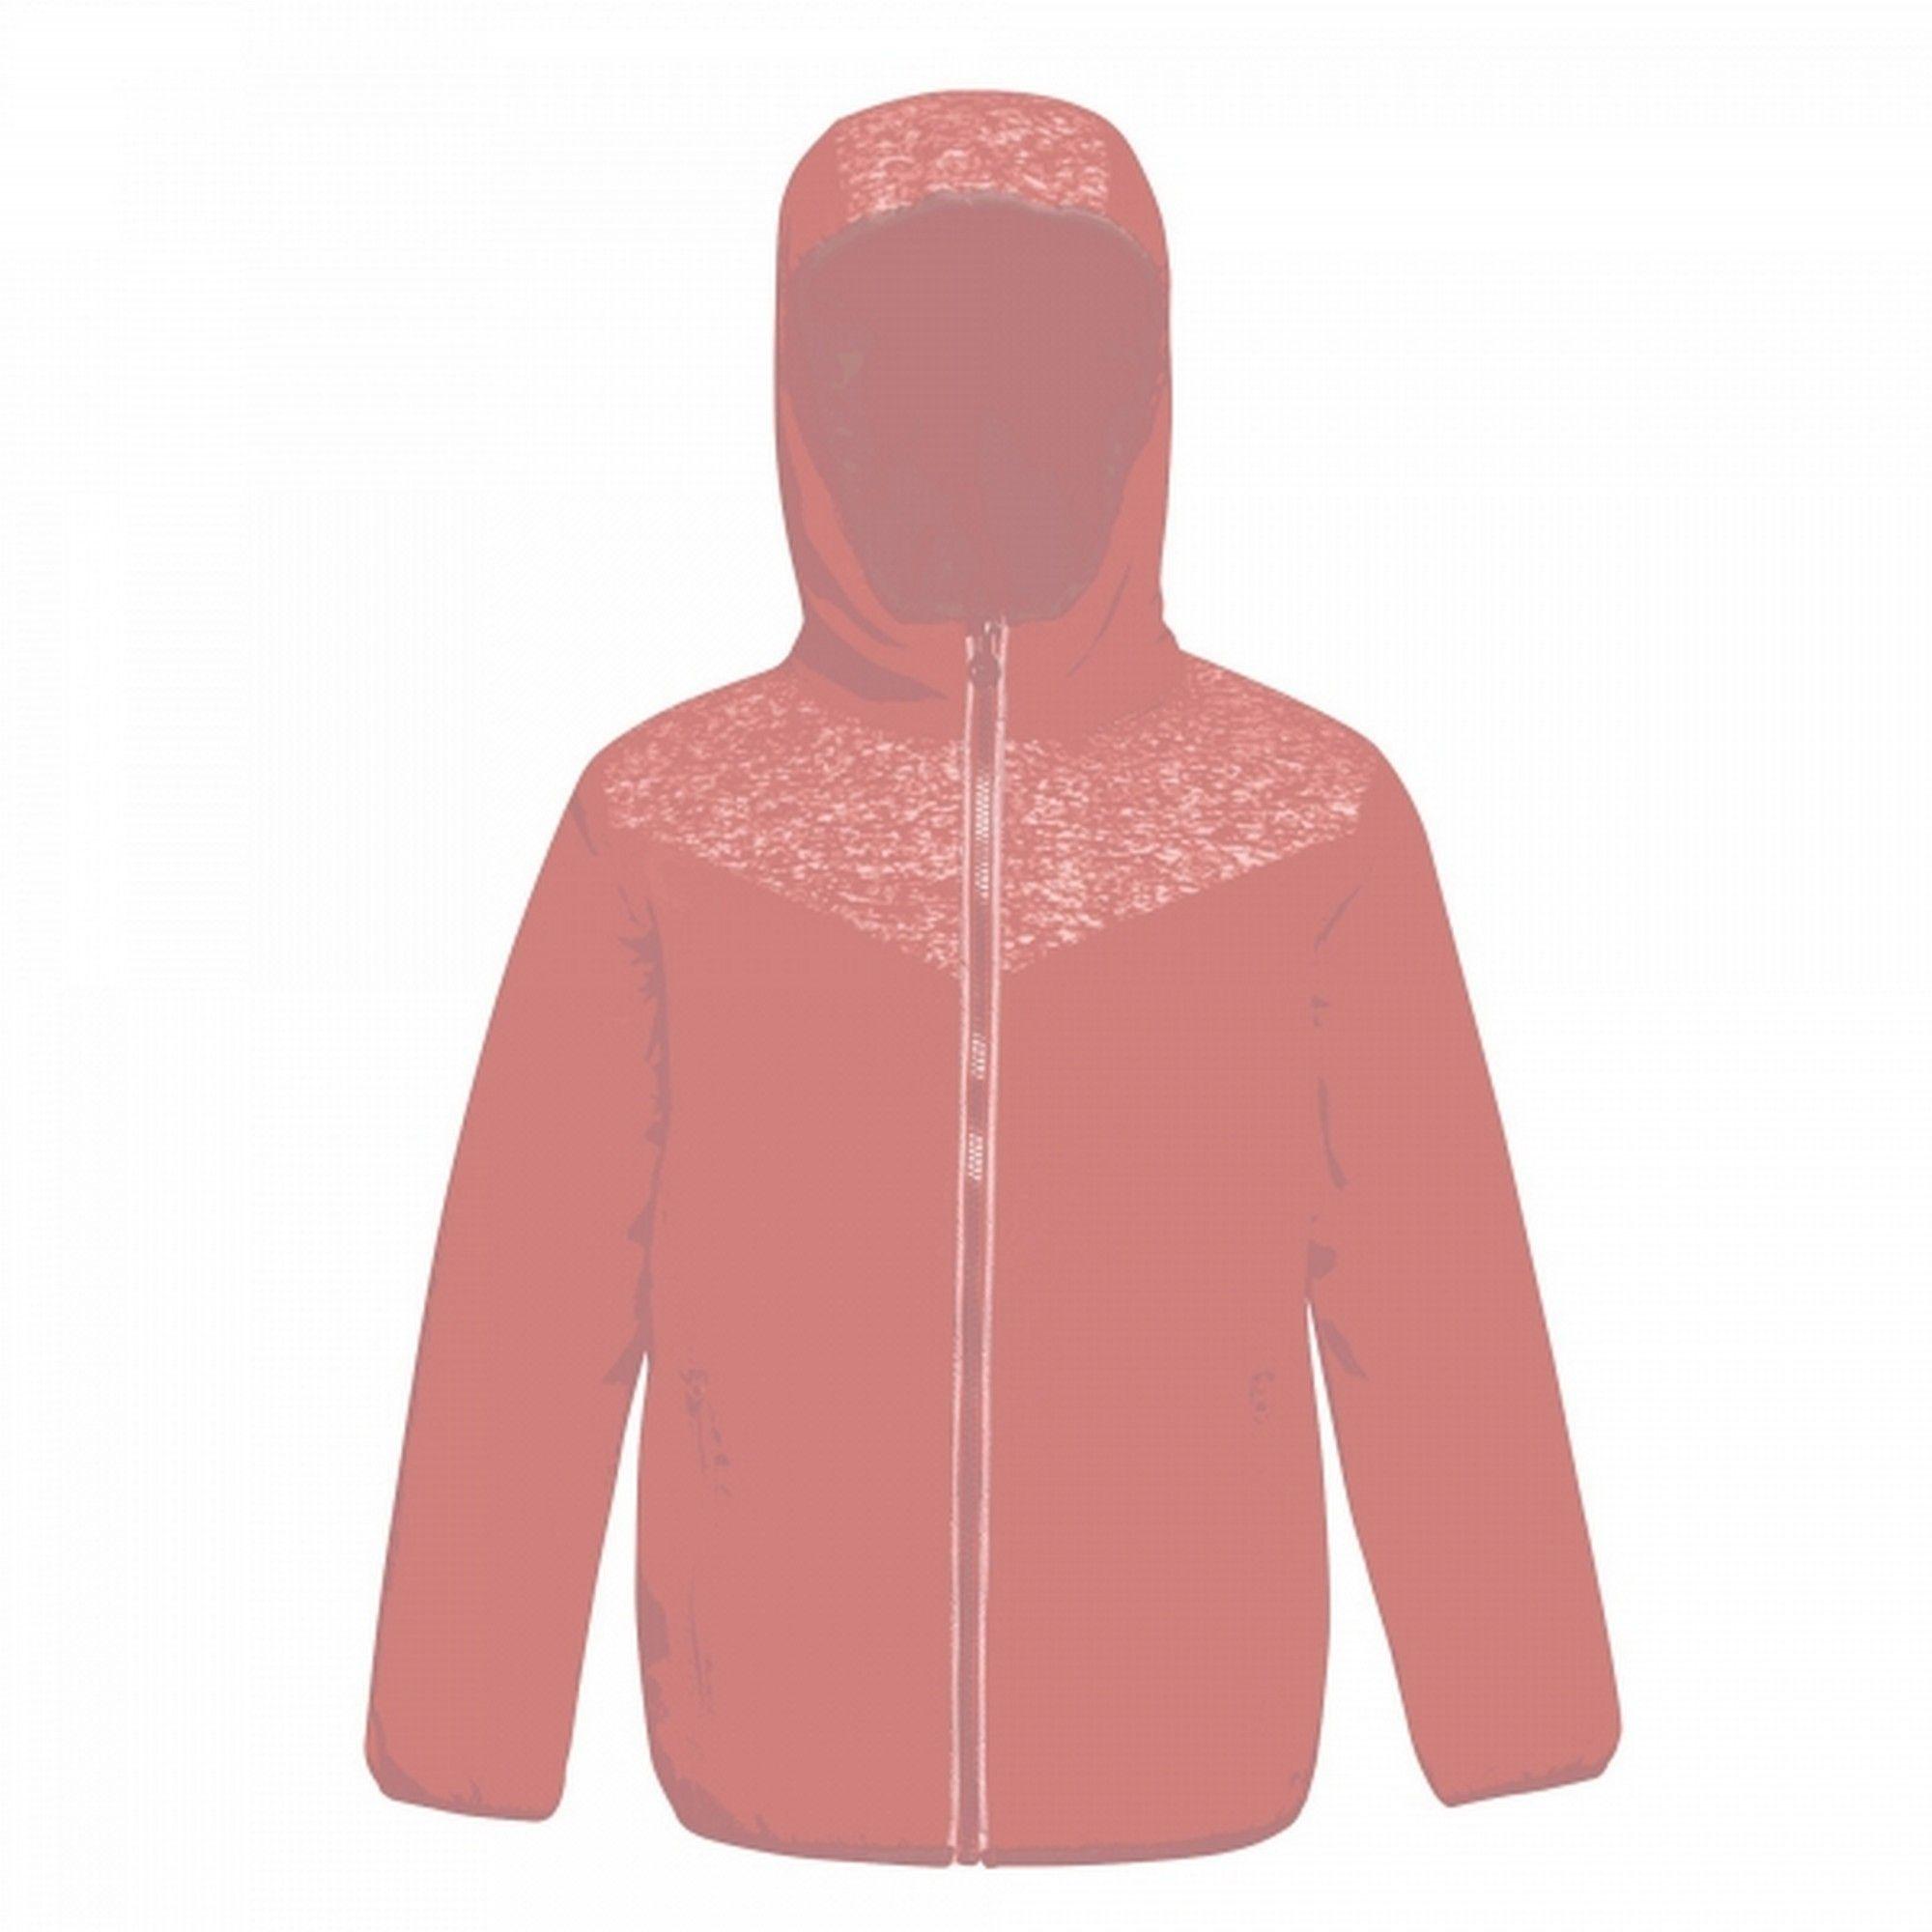 Regatta Childrens/Kids Reflector Hooded Jacket